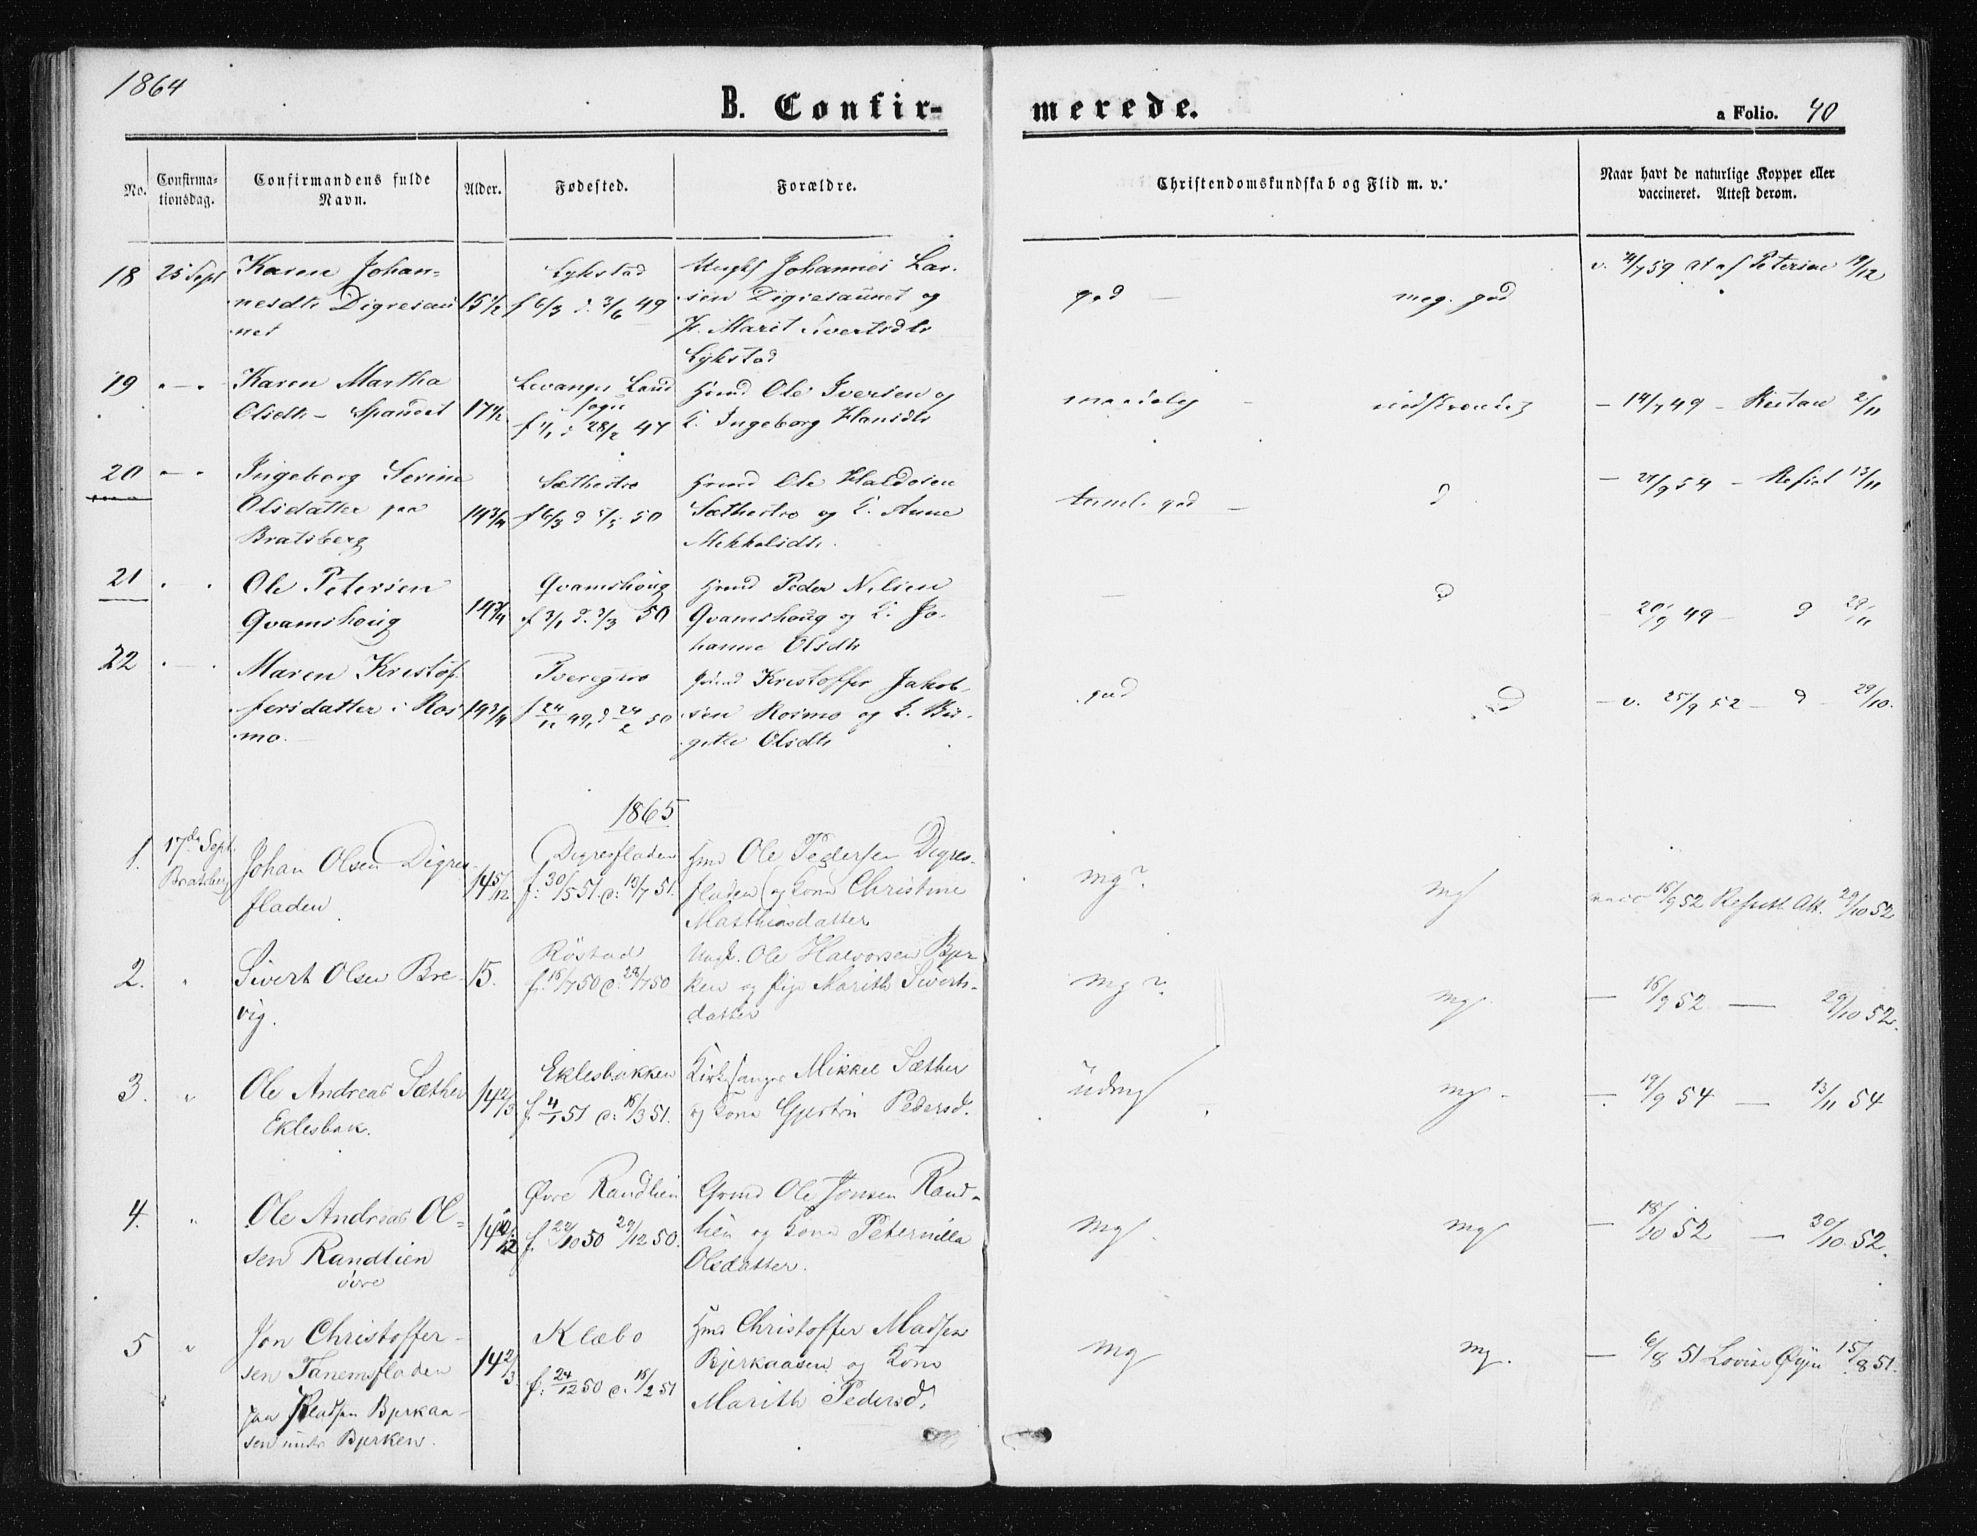 SAT, Ministerialprotokoller, klokkerbøker og fødselsregistre - Sør-Trøndelag, 608/L0333: Parish register (official) no. 608A02, 1862-1876, p. 40